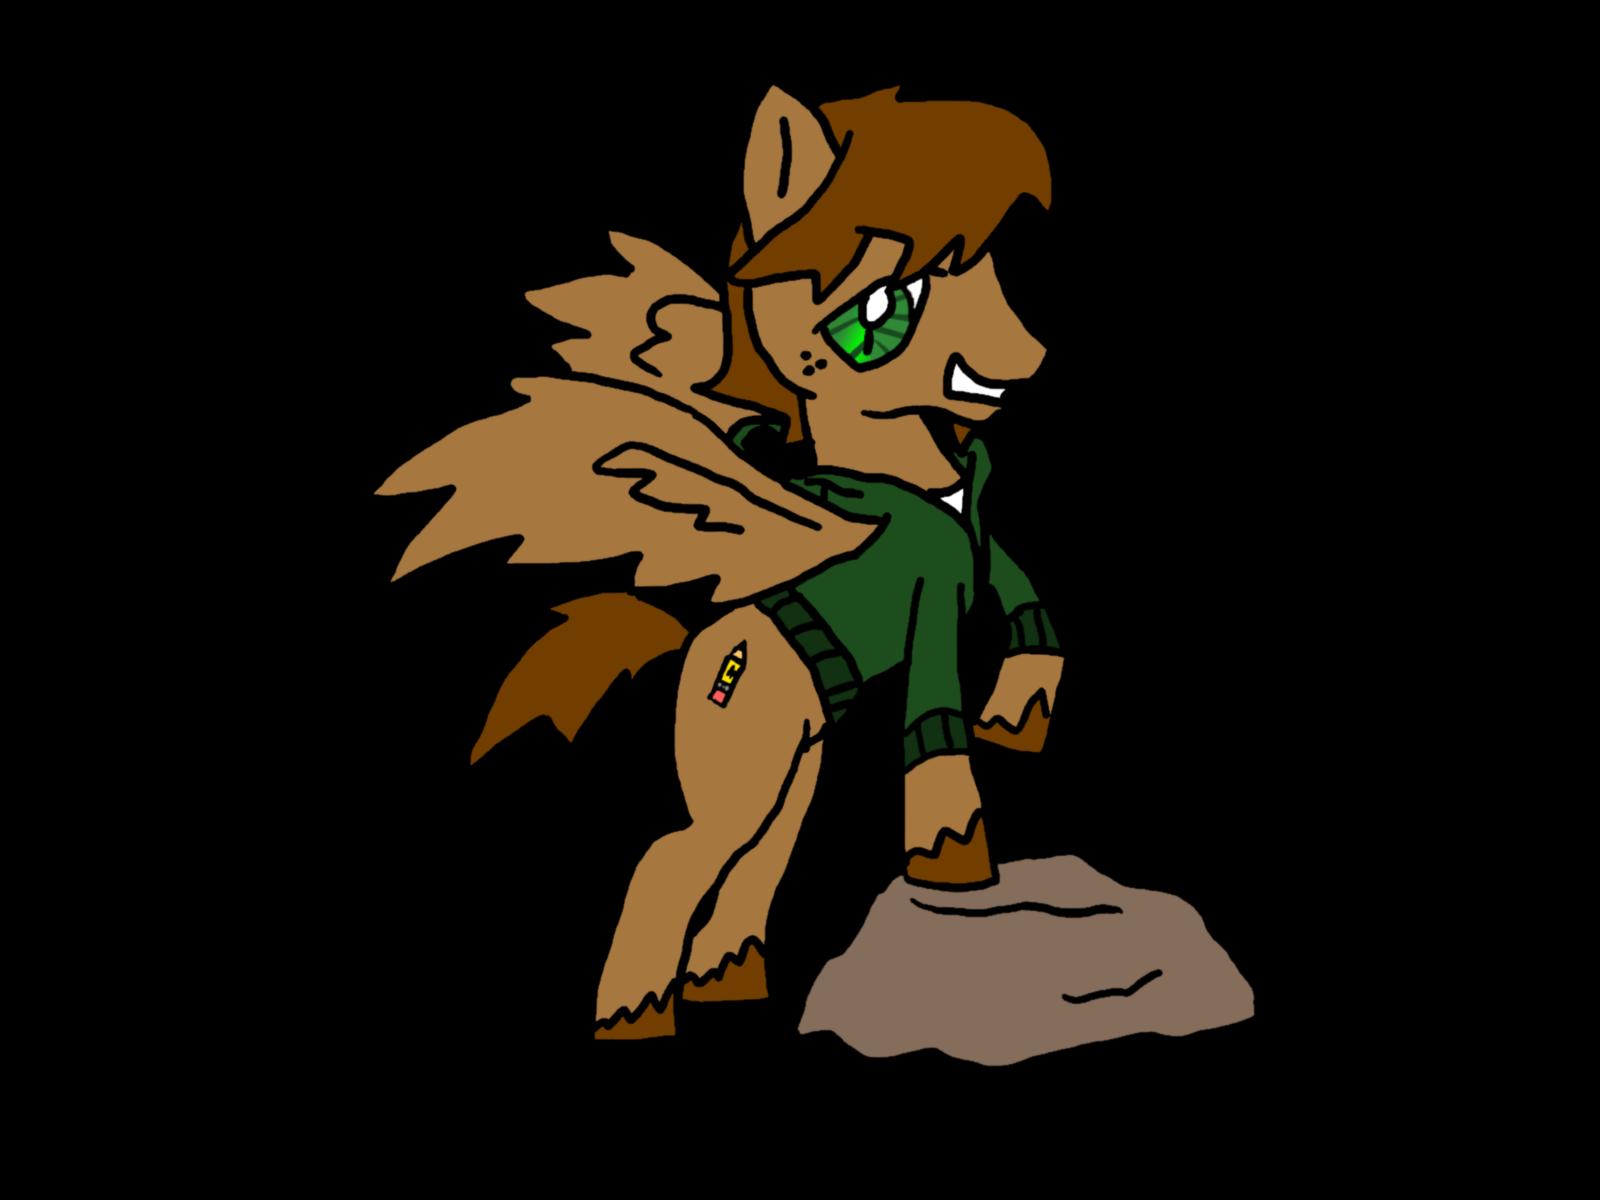 Pony jave